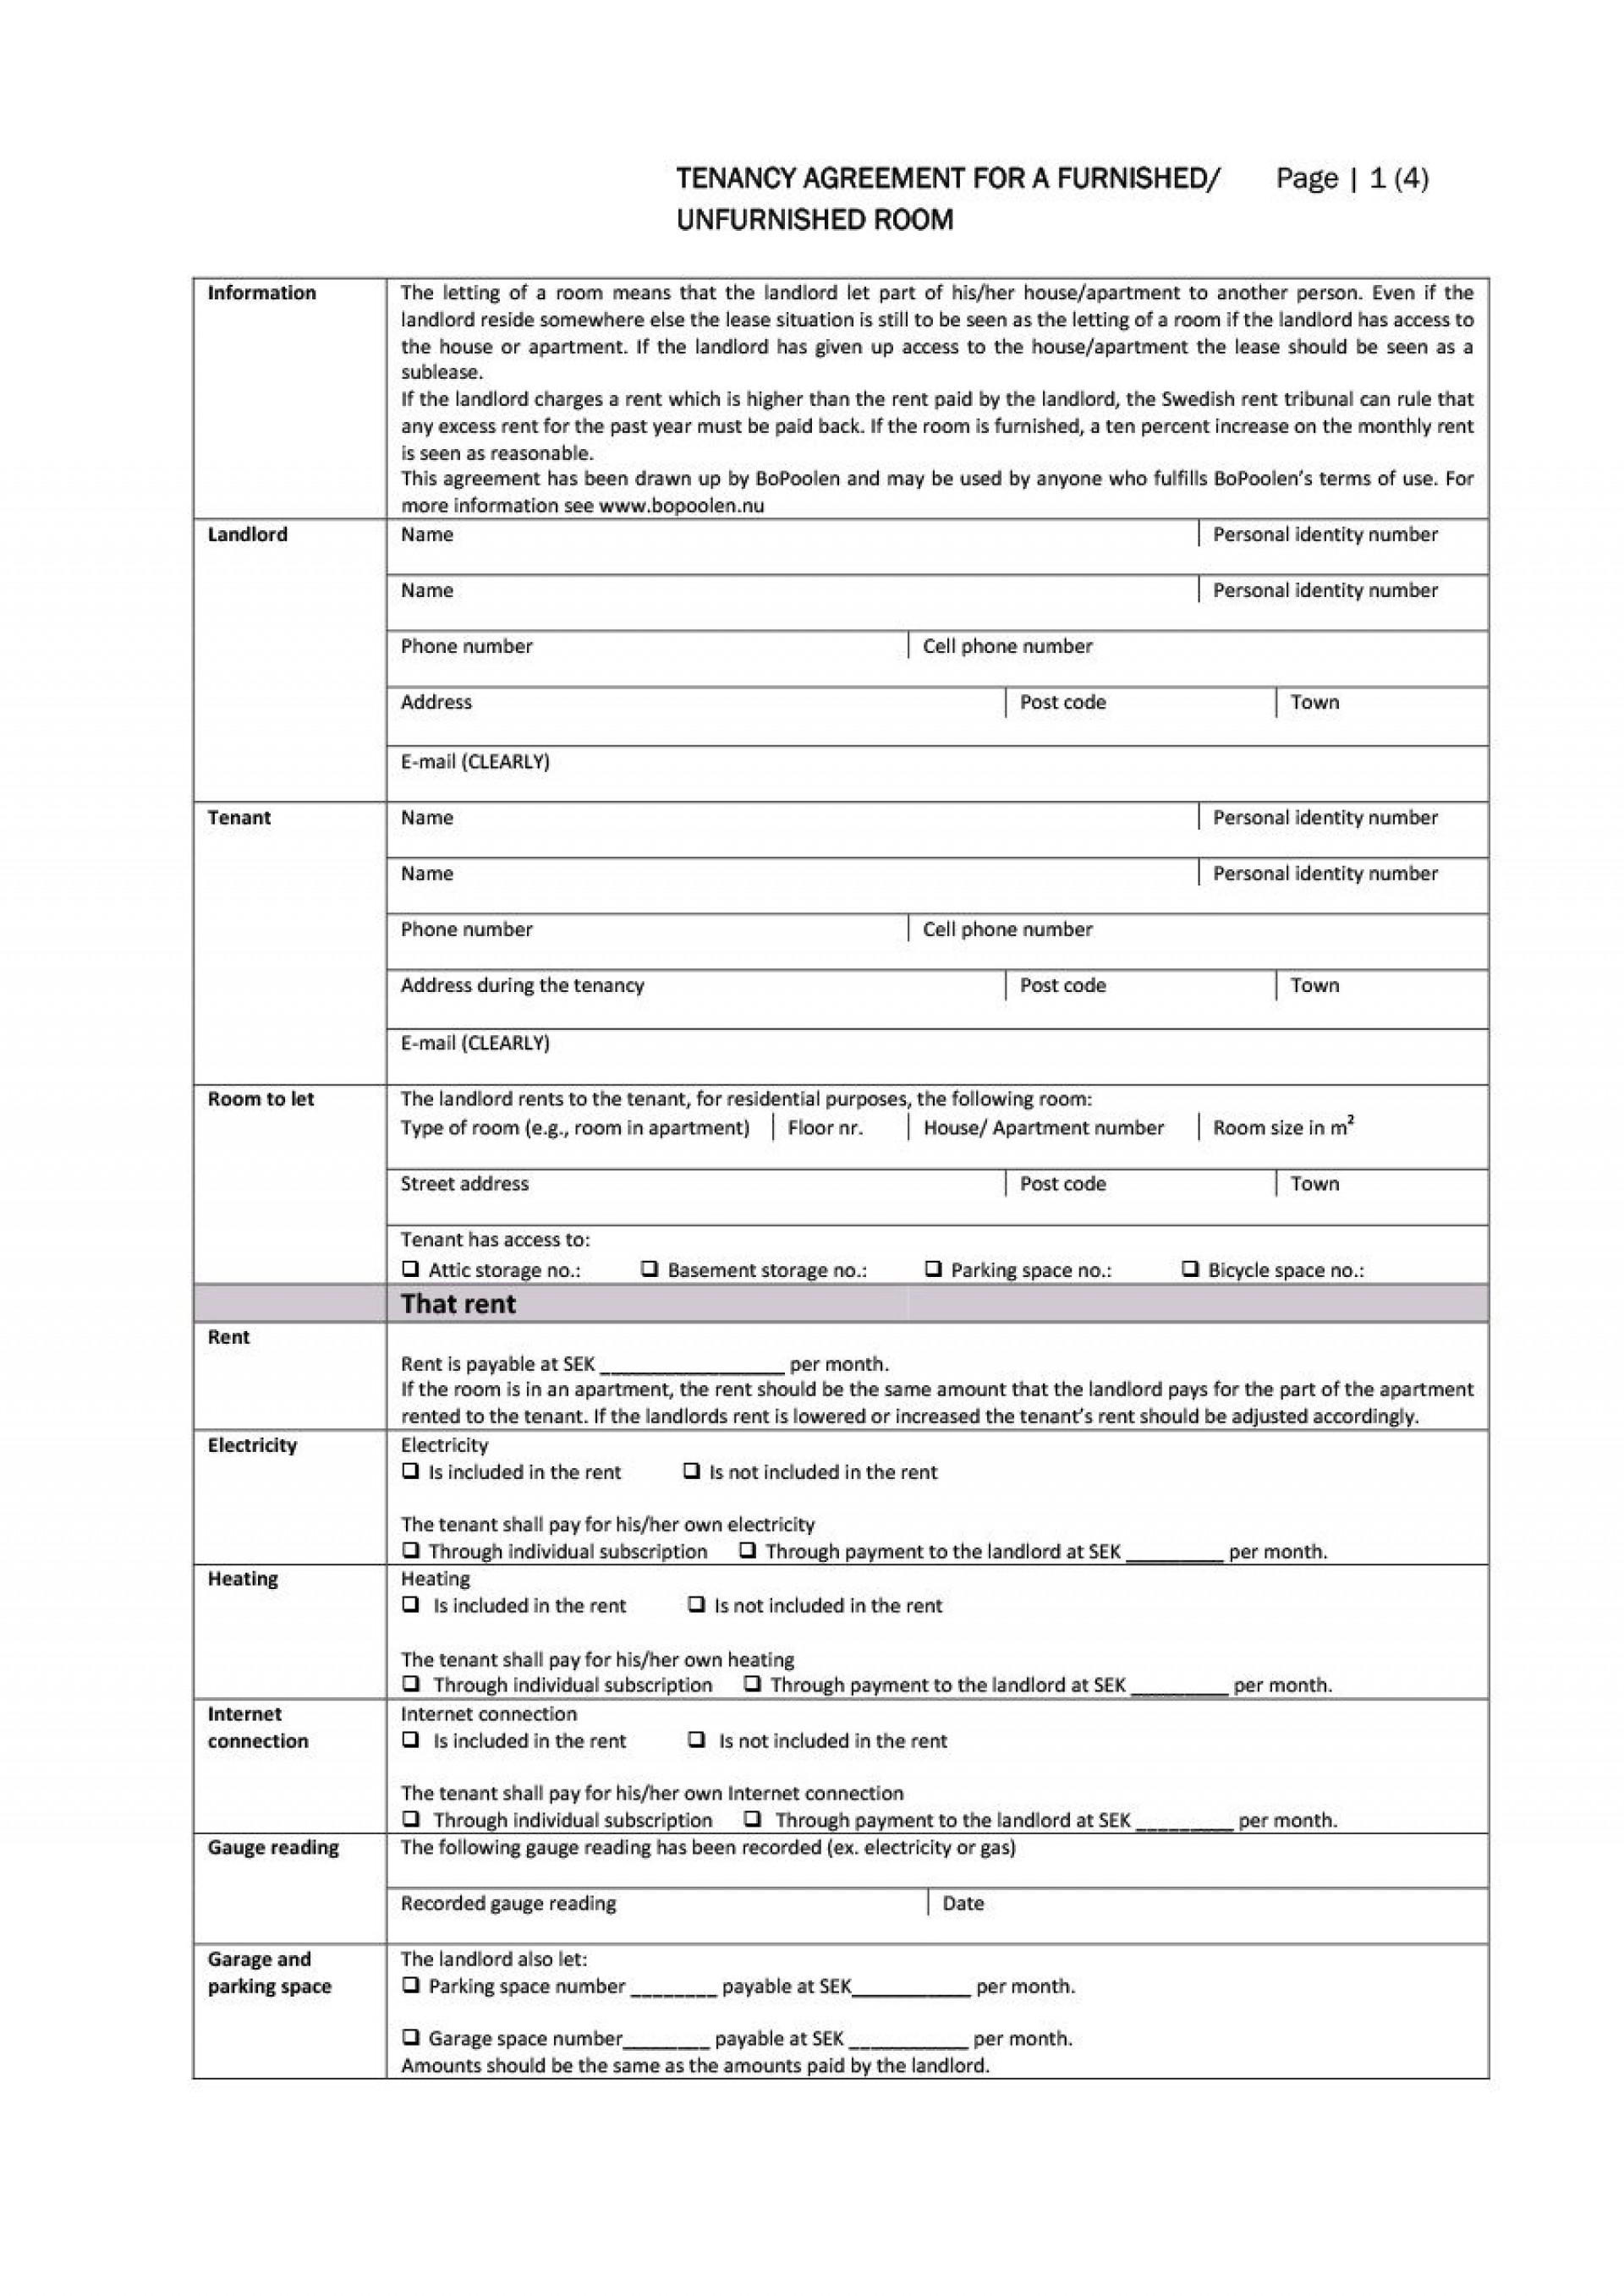 004 Sensational Room Rental Agreement Template Word Doc Malaysia Highest Quality 1920